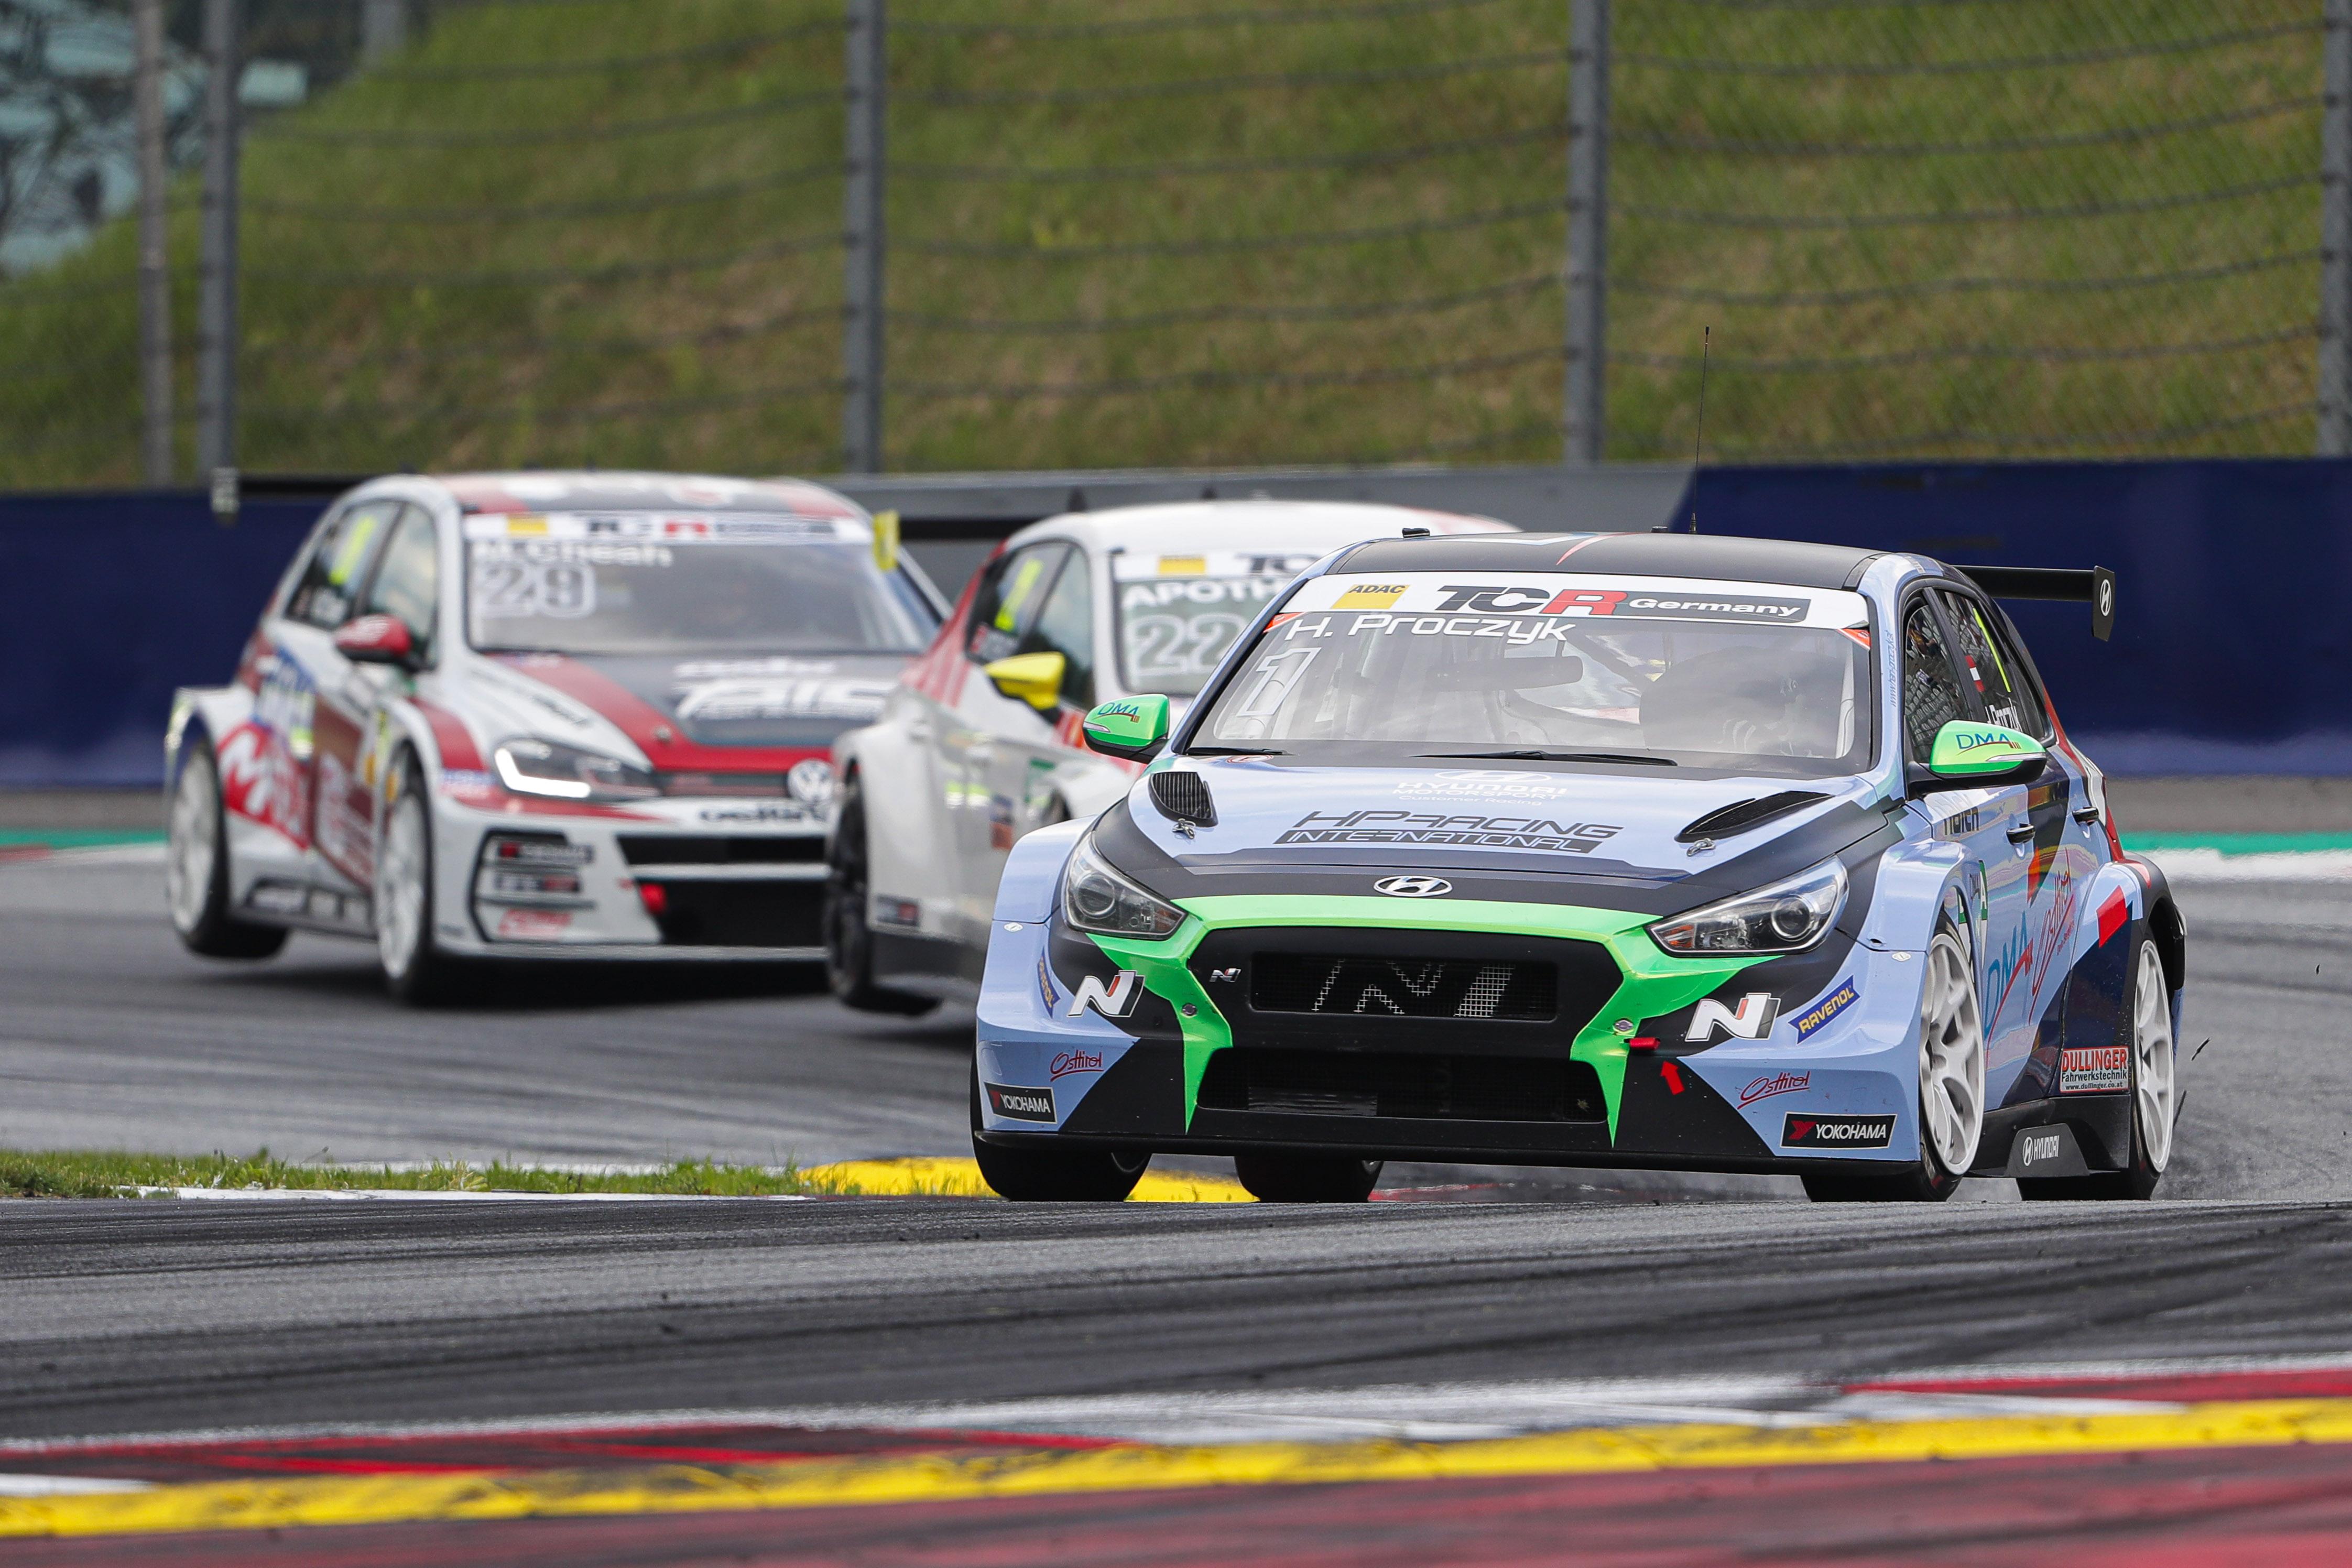 Titelverteidiger Harald Proczyk greift im Hyundai i30 N TCR an